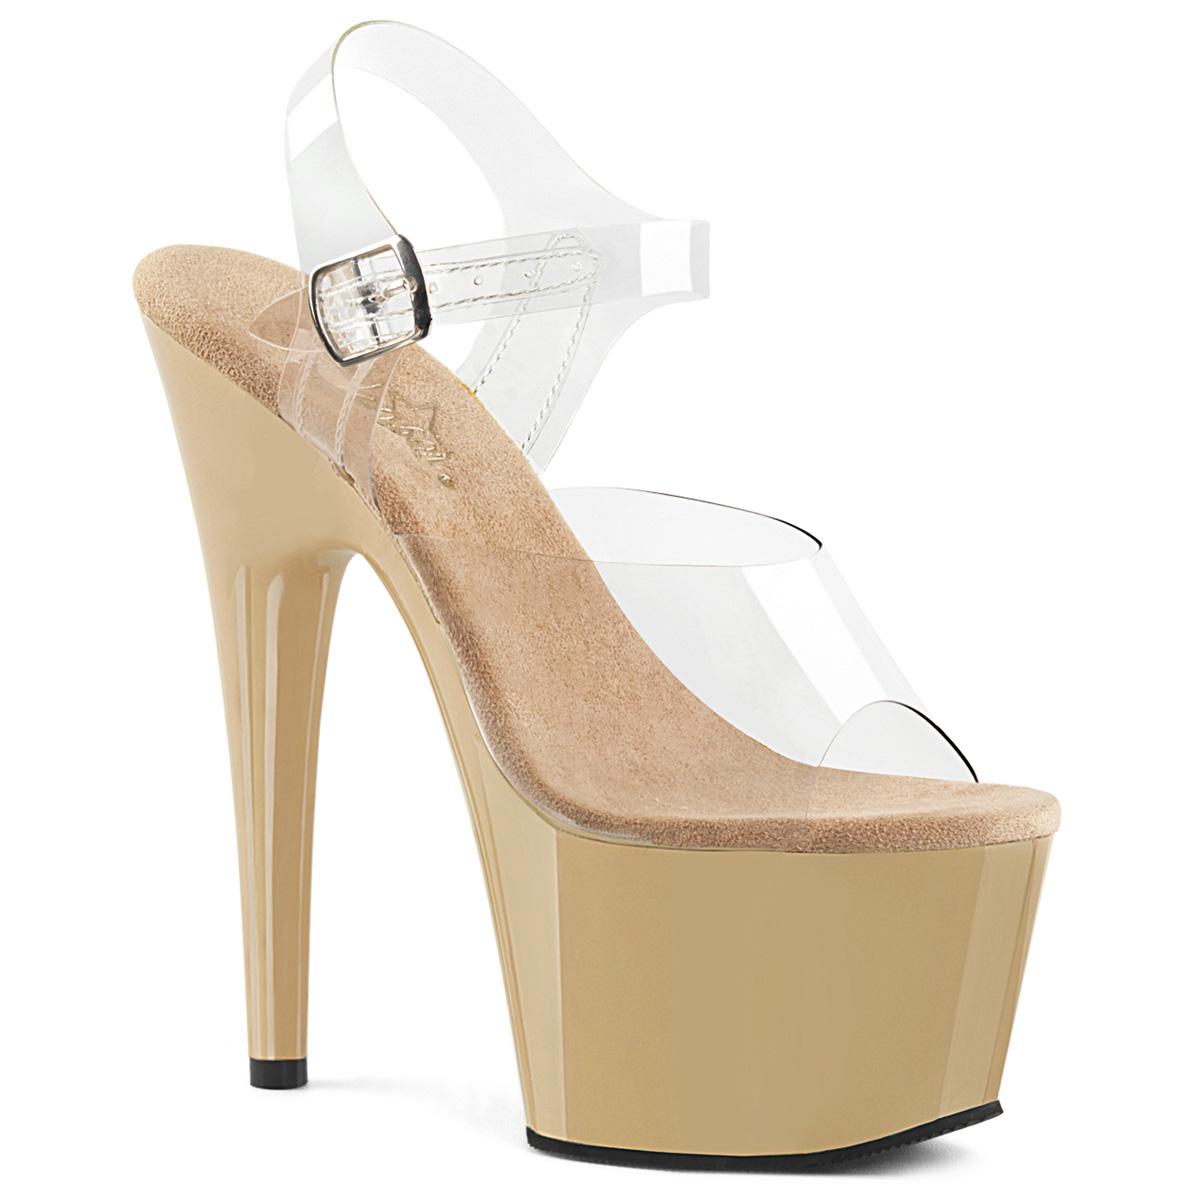 489994cda Platform High Heels ADORE-708 - Cream, Pleaser